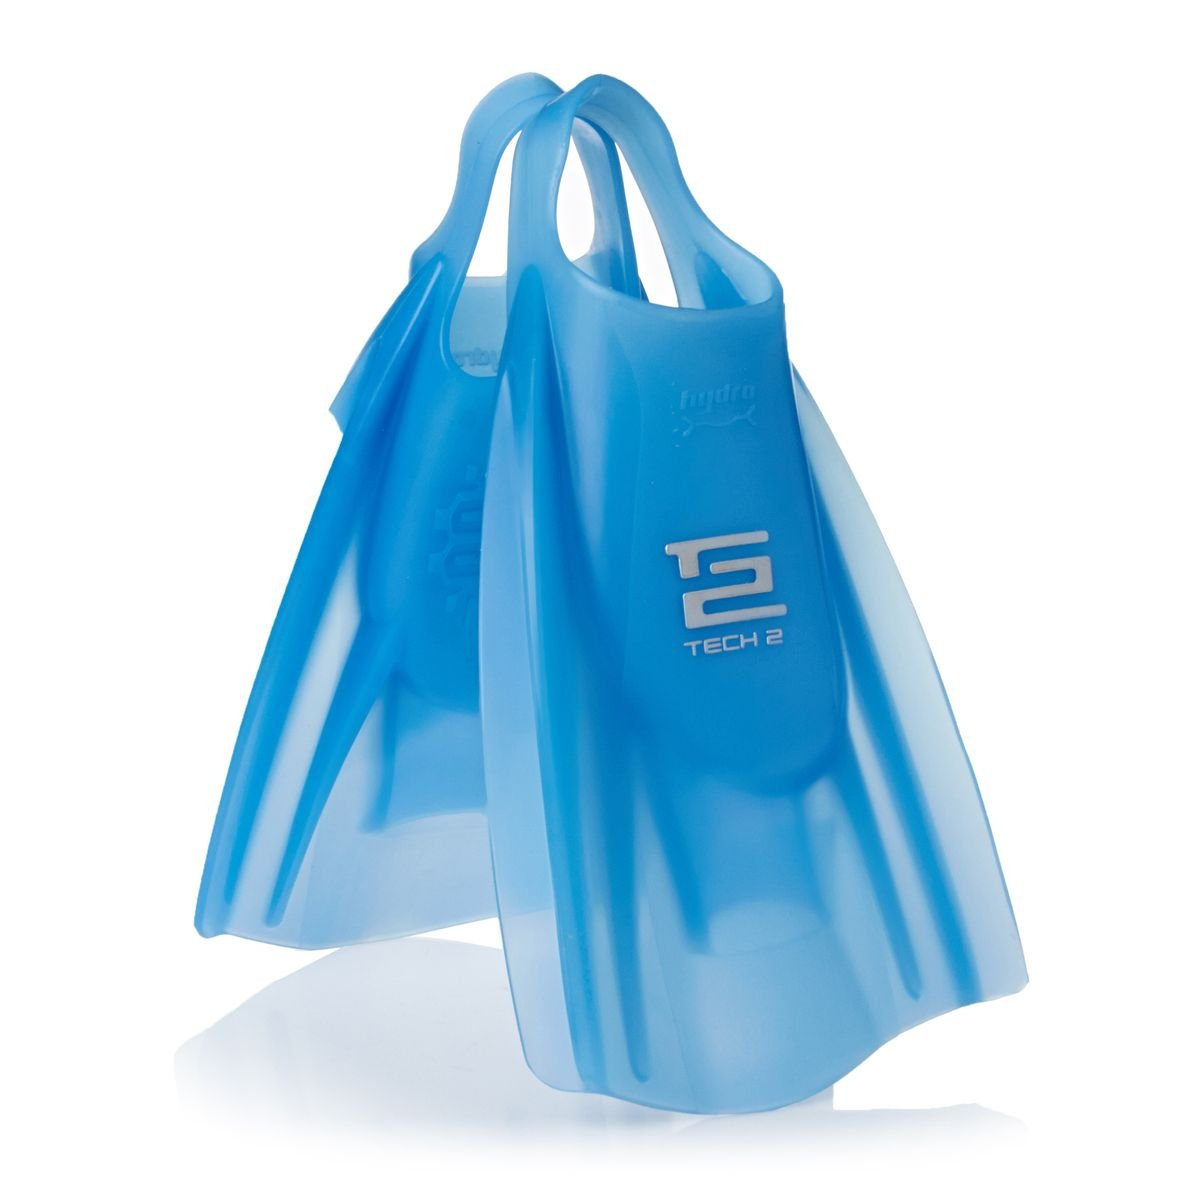 Ice Blue Hydro Tech 2 Swim Fins